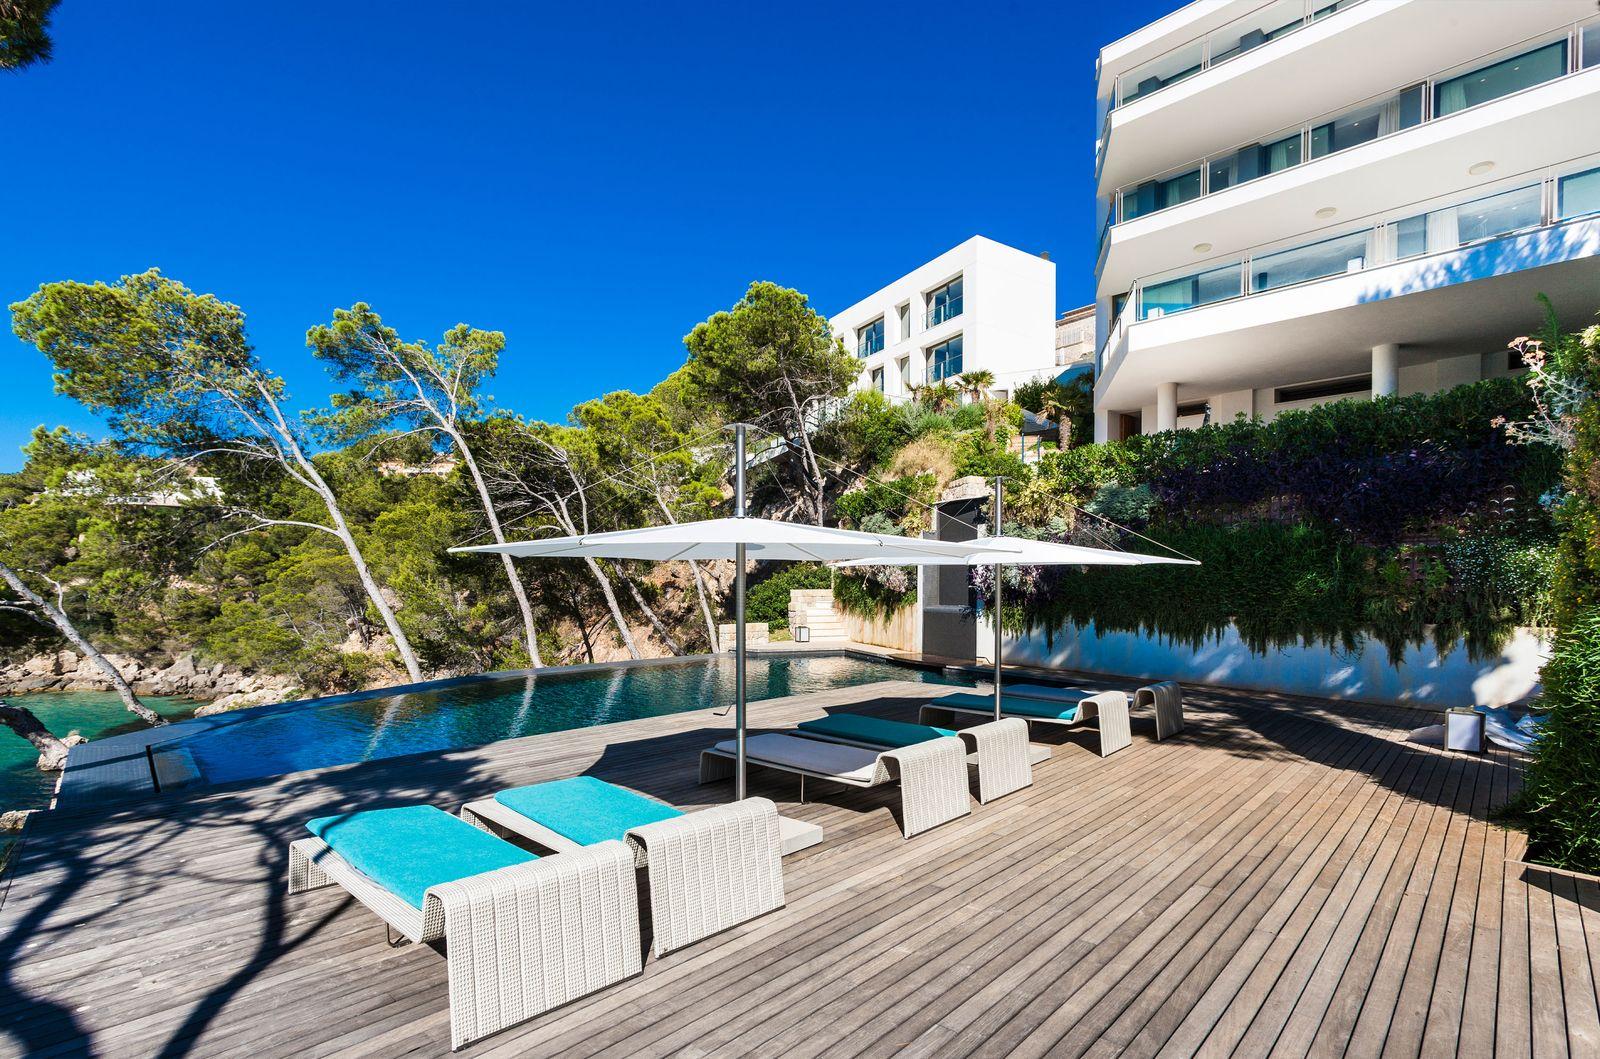 Poolside Shade Mallorca